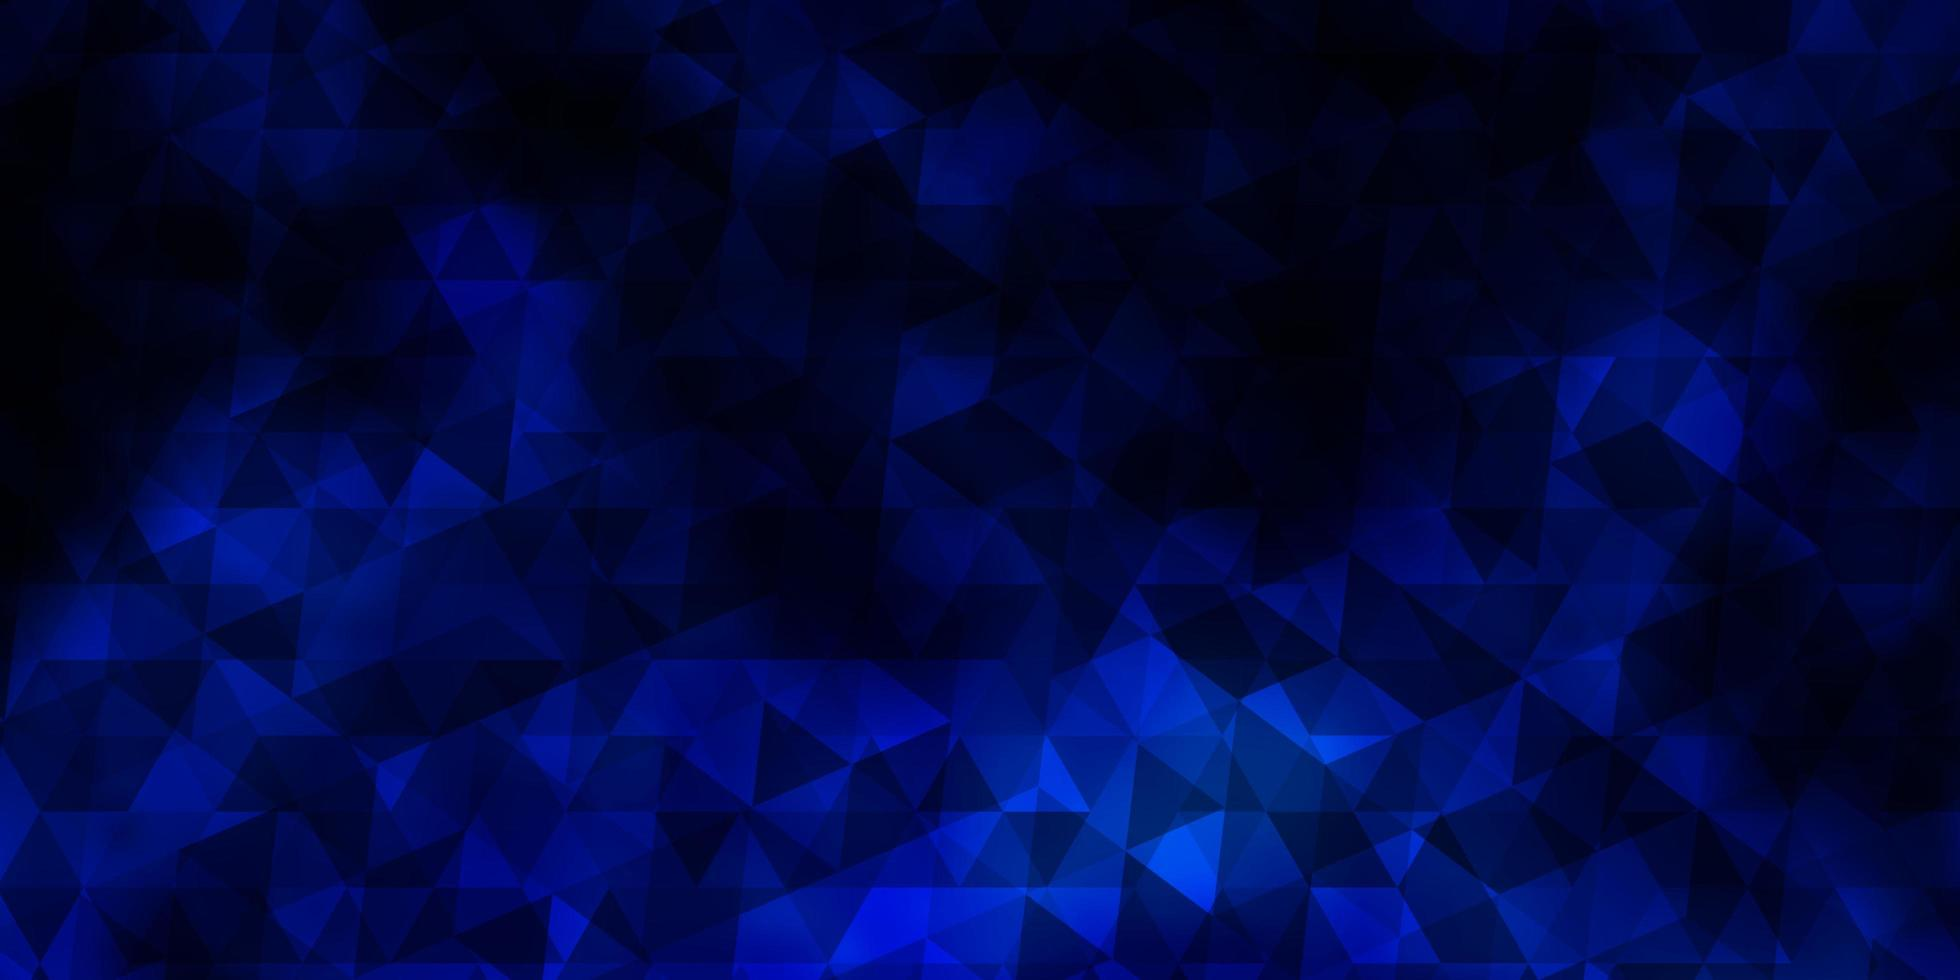 fundo vector azul escuro com triângulos.